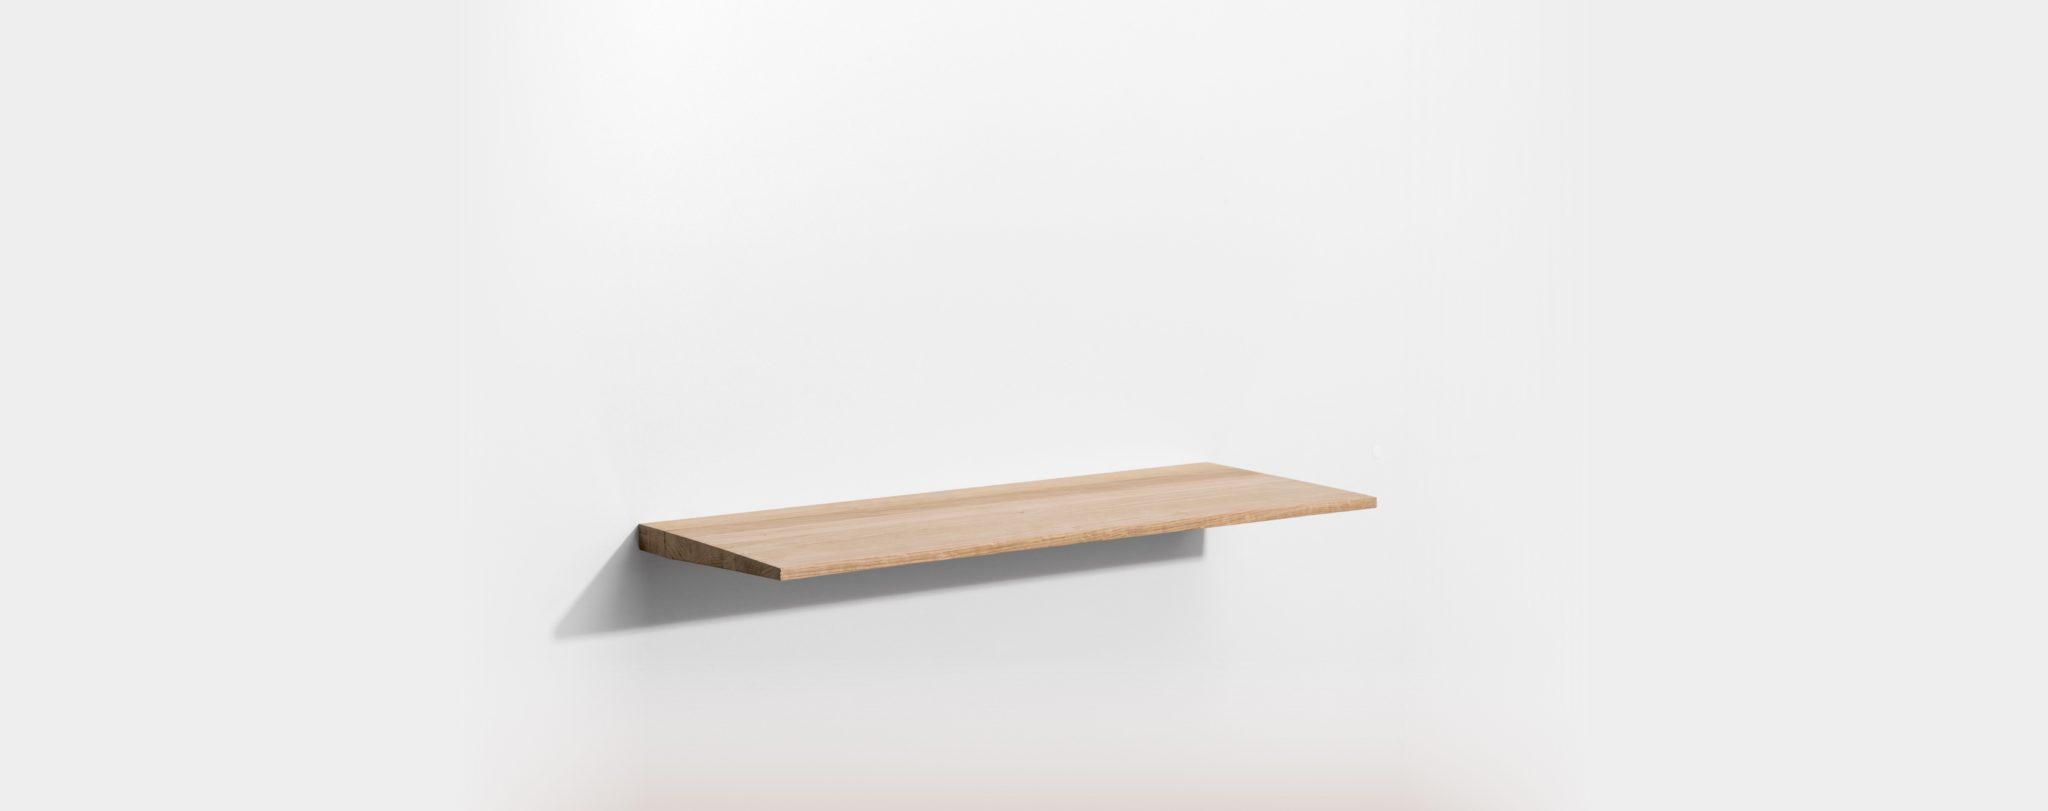 header-fixsy-design-pierre-sandoz_S12